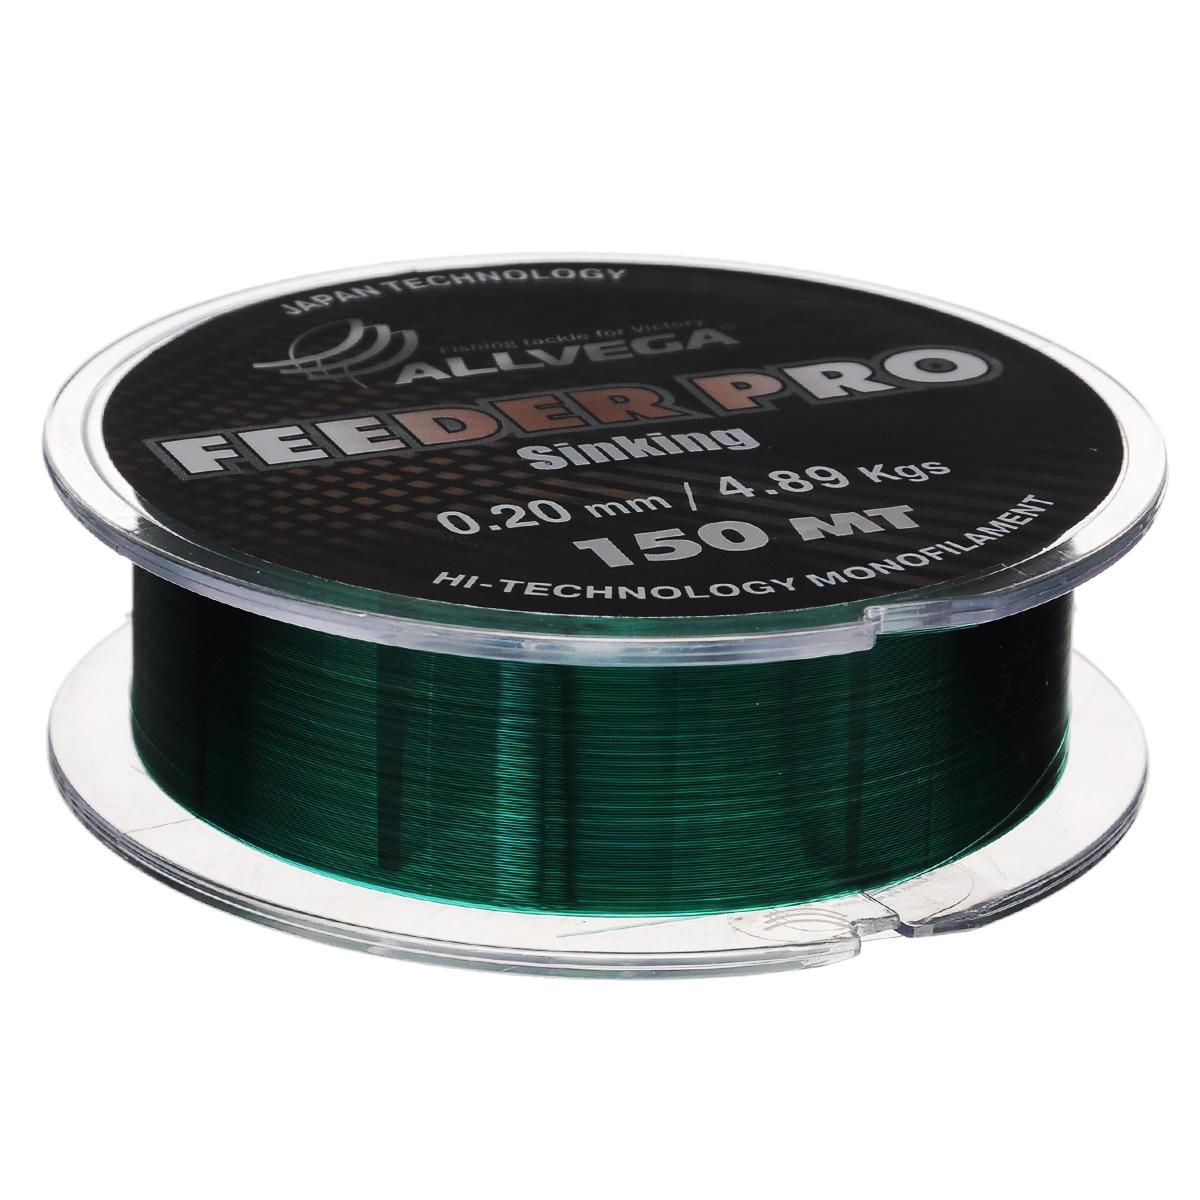 Леска Allvega Feeder Pro Sinking, цвет: темно-зеленый, 150 м, 0,2 мм, 4,89 кг